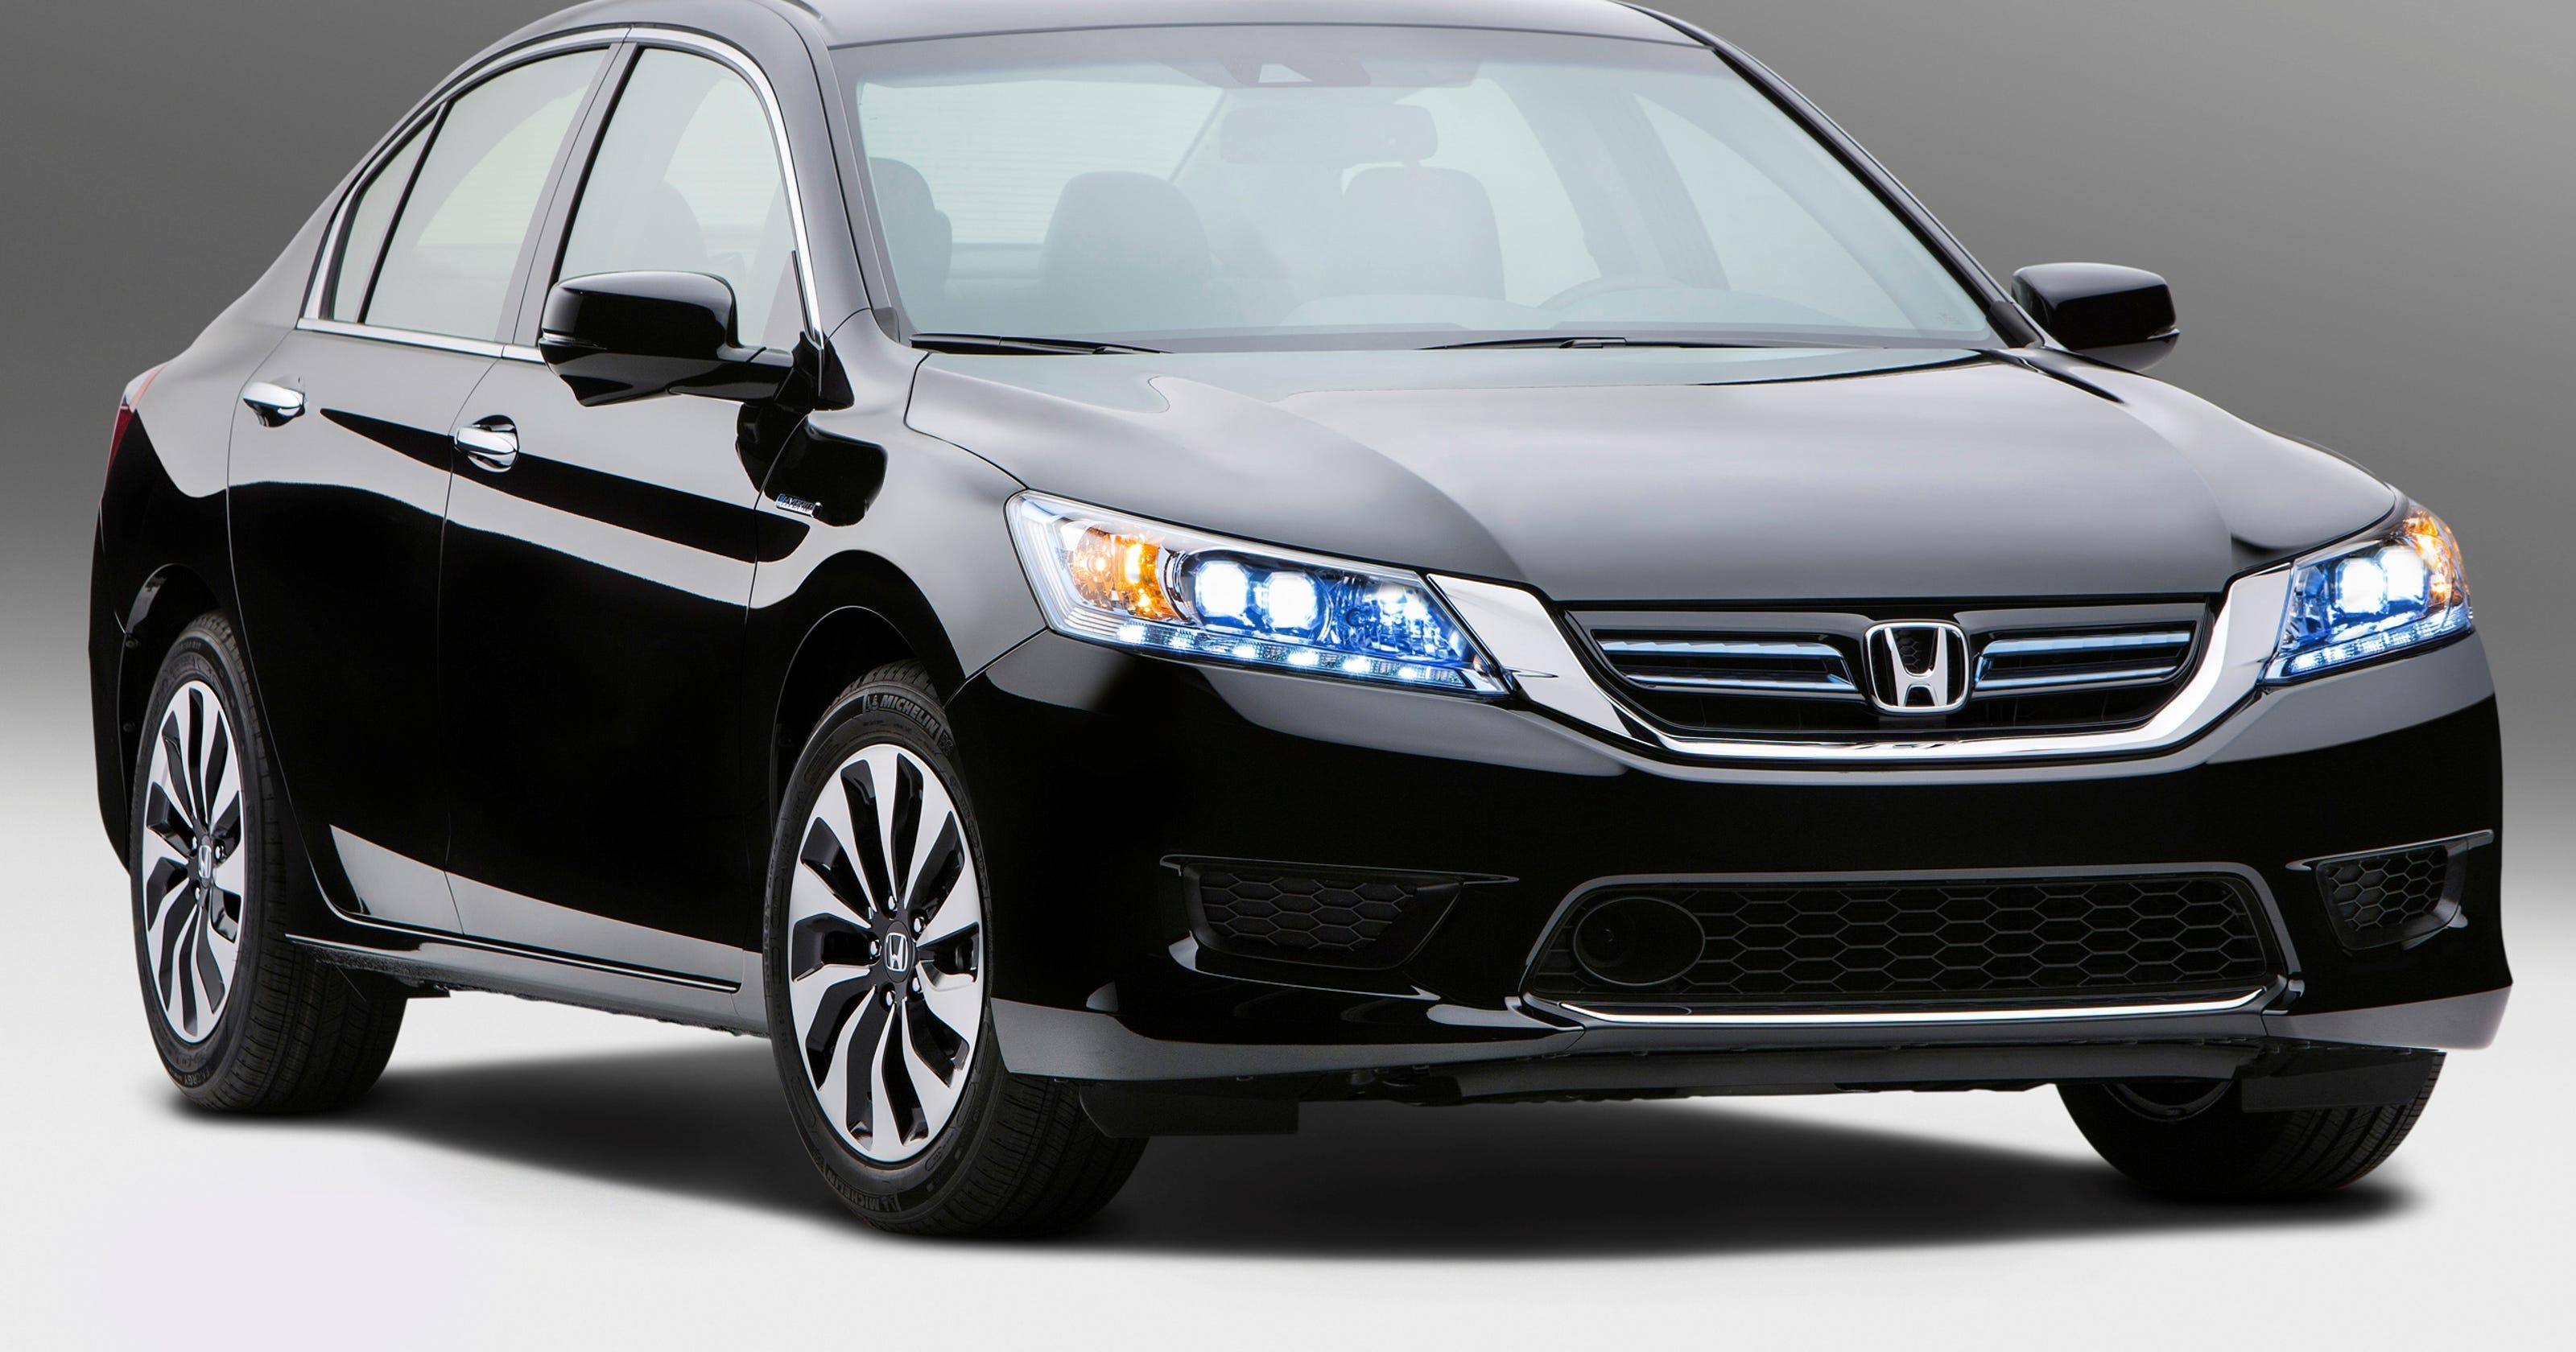 Honda says Accord Hybrid\'s 47 mpg tops Camry